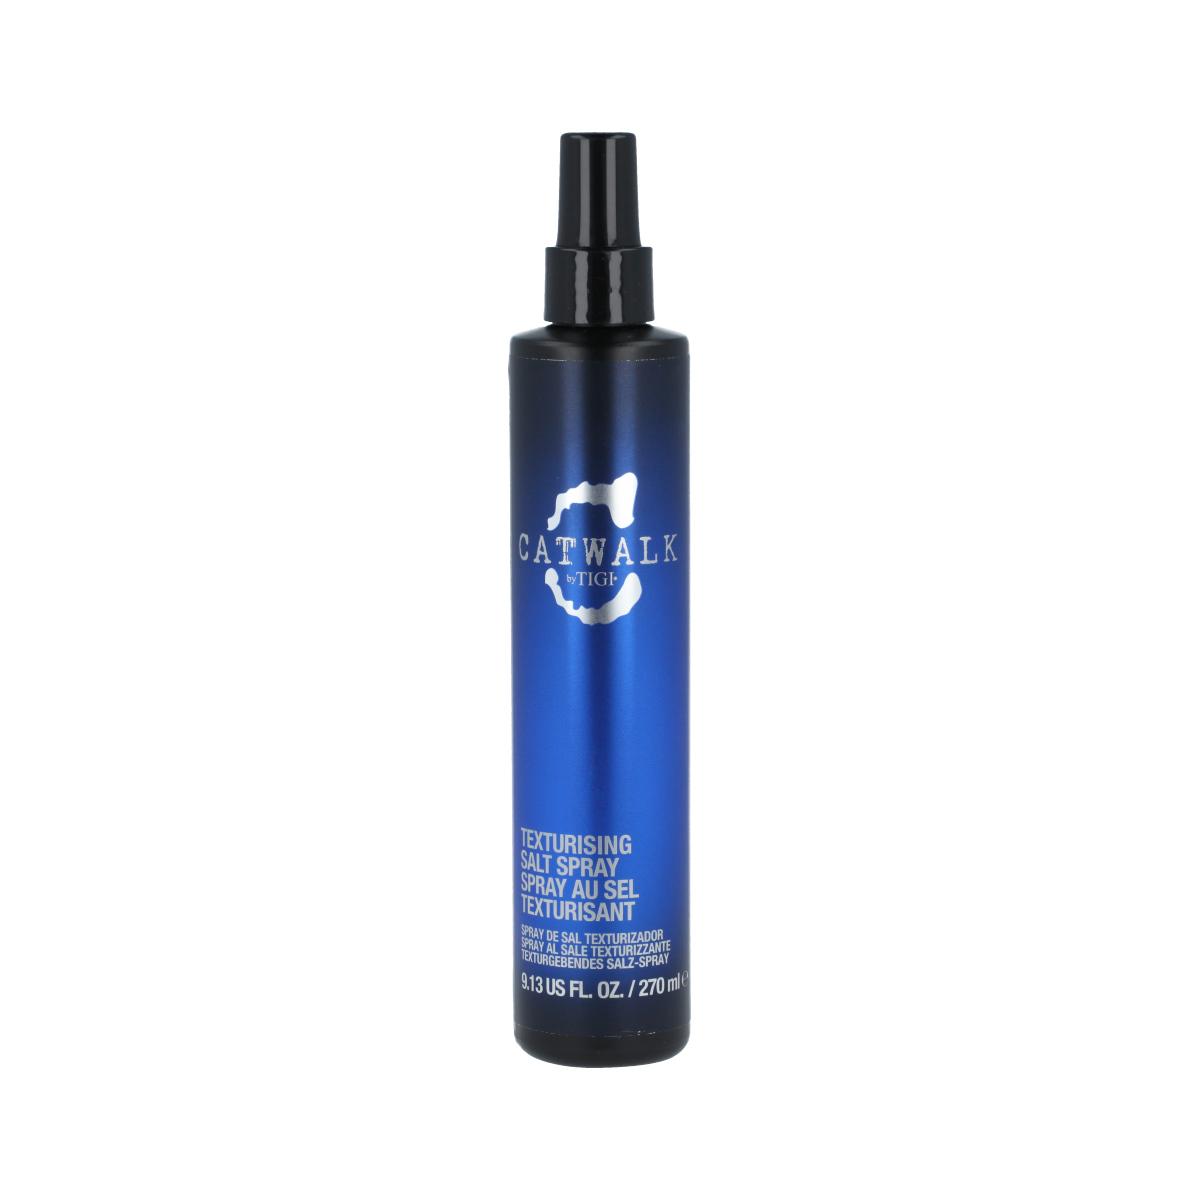 Tigi Catwalk Texturising Salt Spray 270 ml 89112